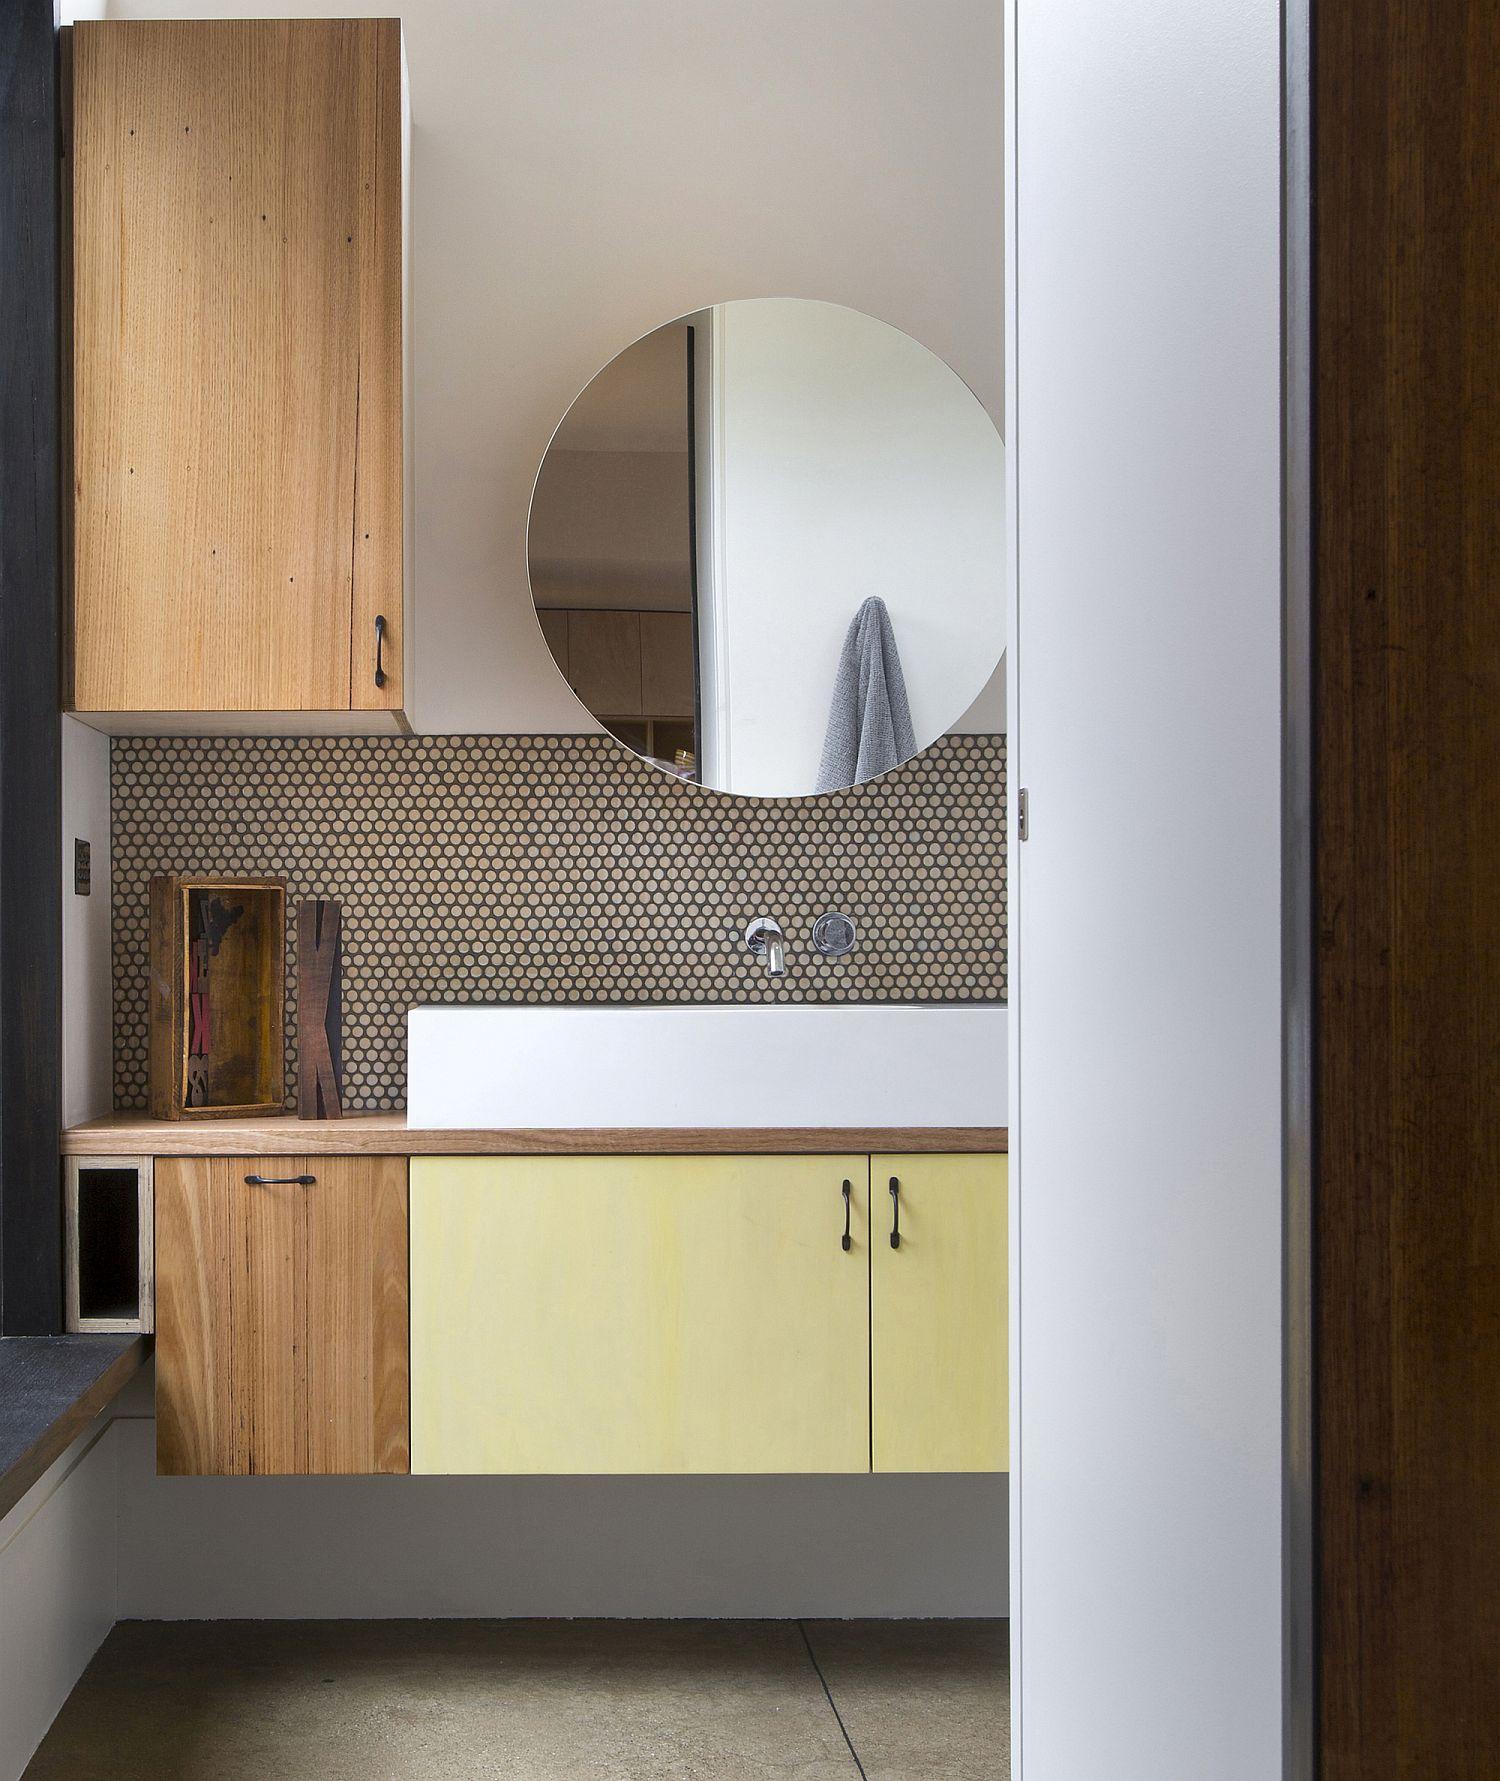 Minimal modern bathroom with round mirror and penny tile backsplash